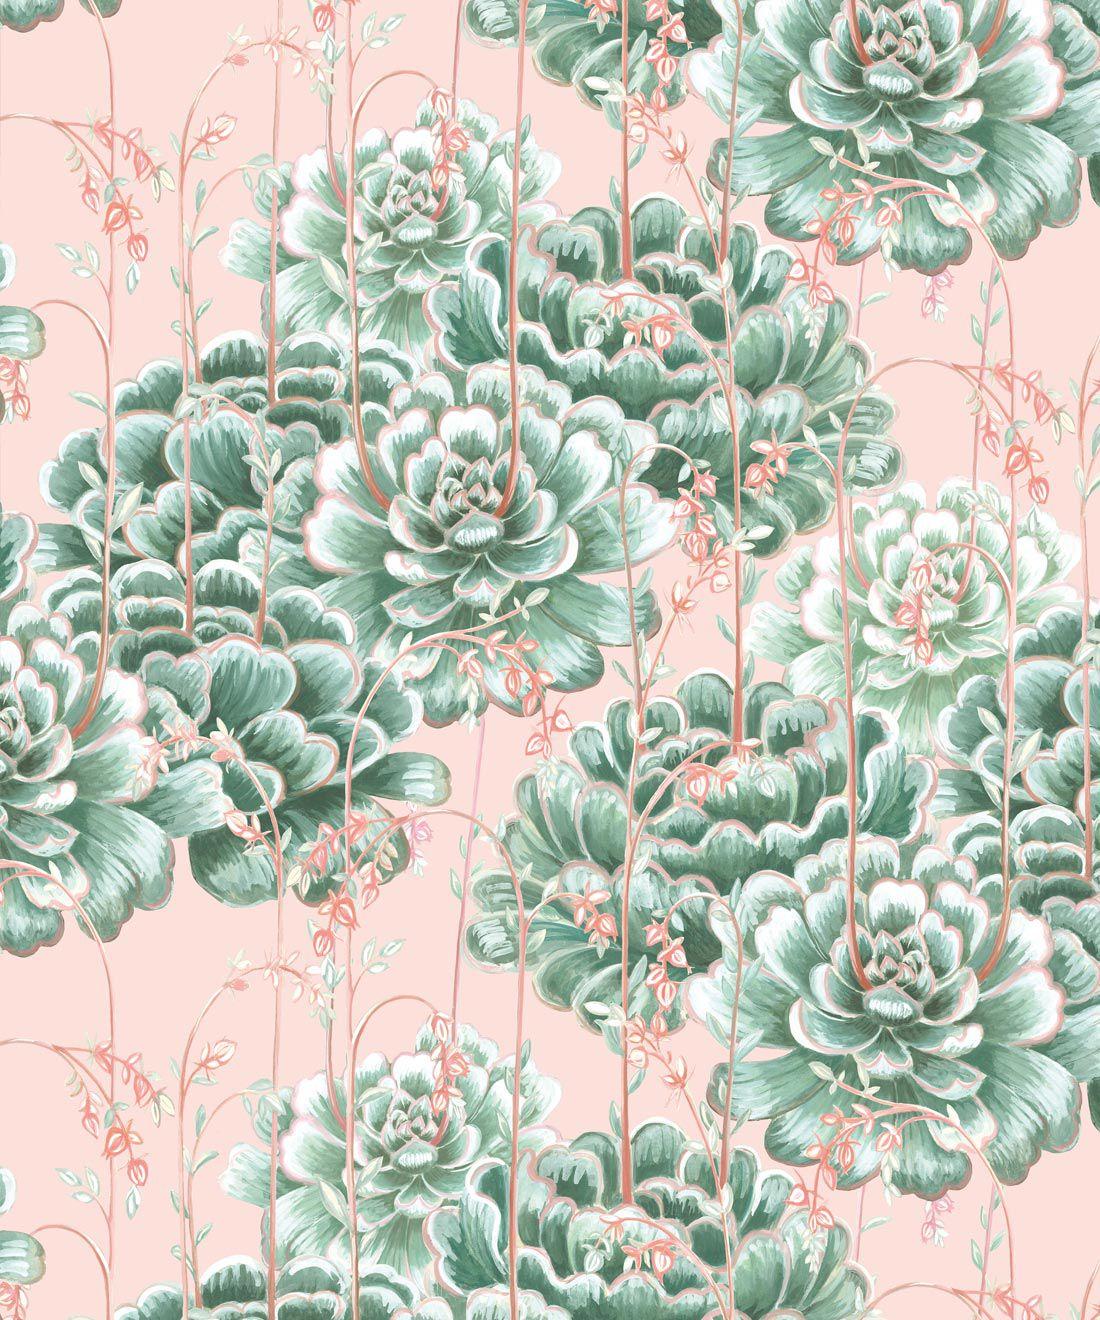 Succulents Wallpaper Green Pink • Cactus Wallpaper • Desert Wallpaper Swatch on pink background